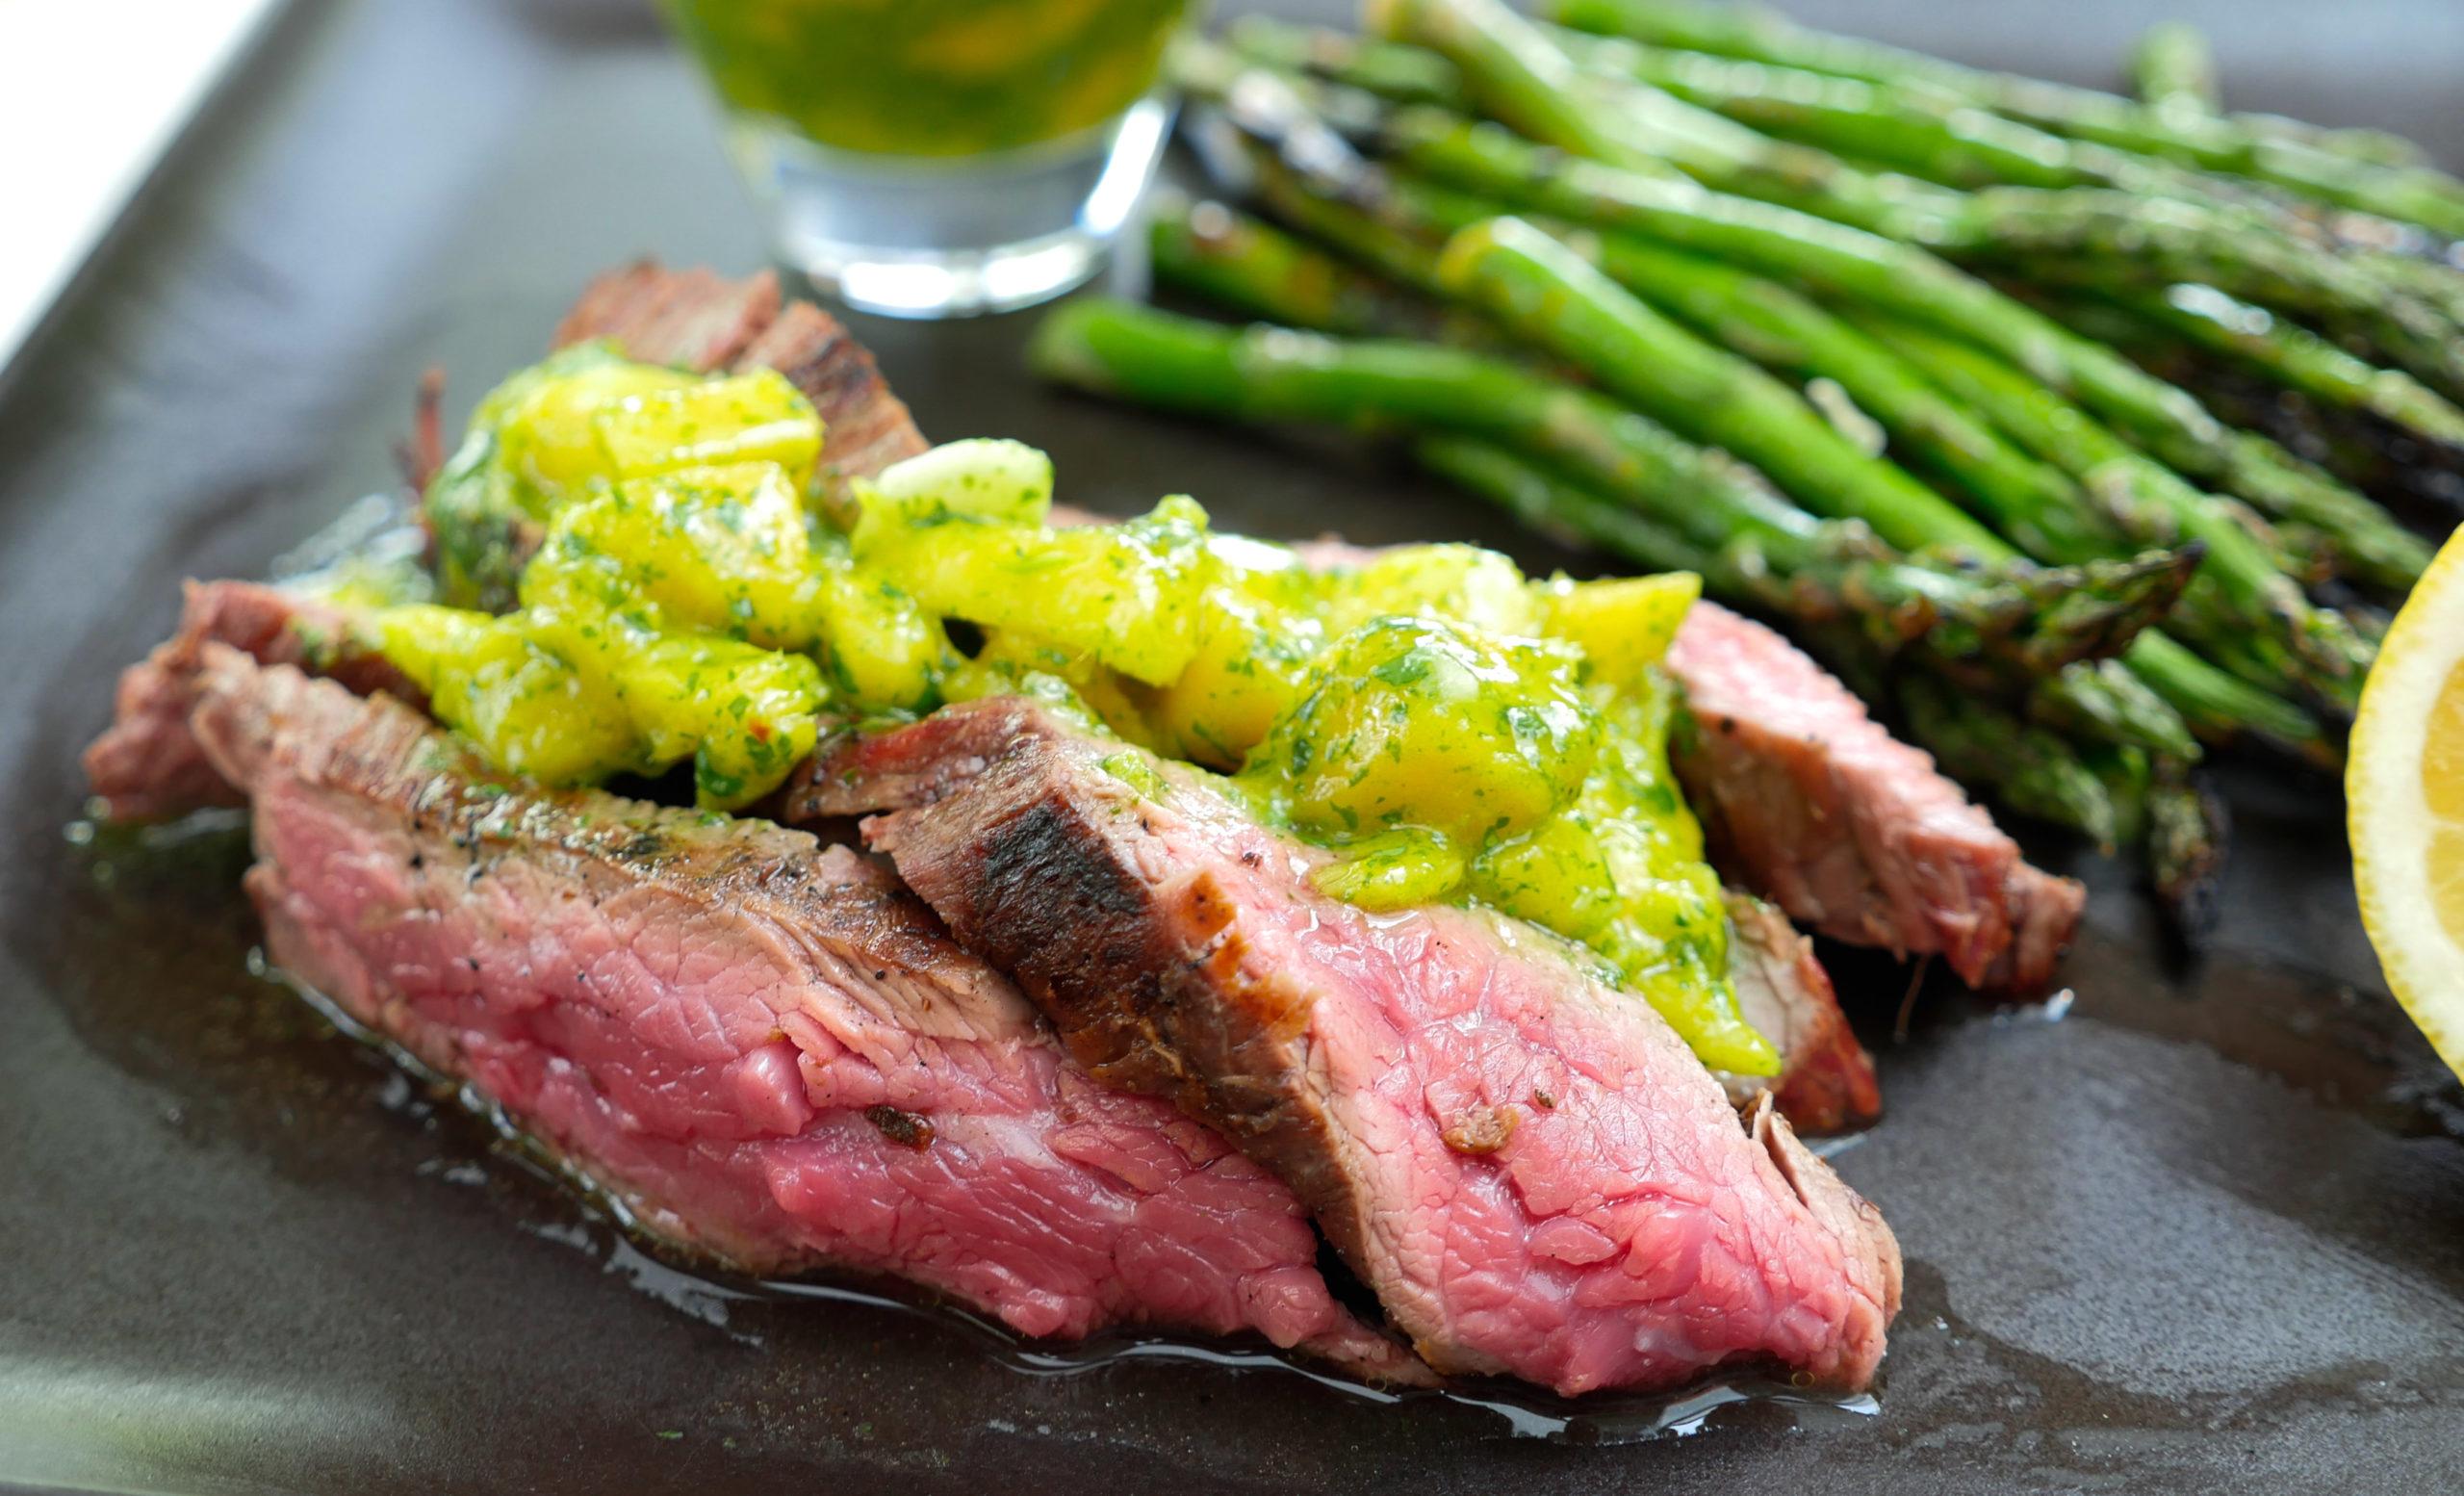 Eva Amurri shares her recipe for Grilled Skirt Steak with Mango Chimichurri